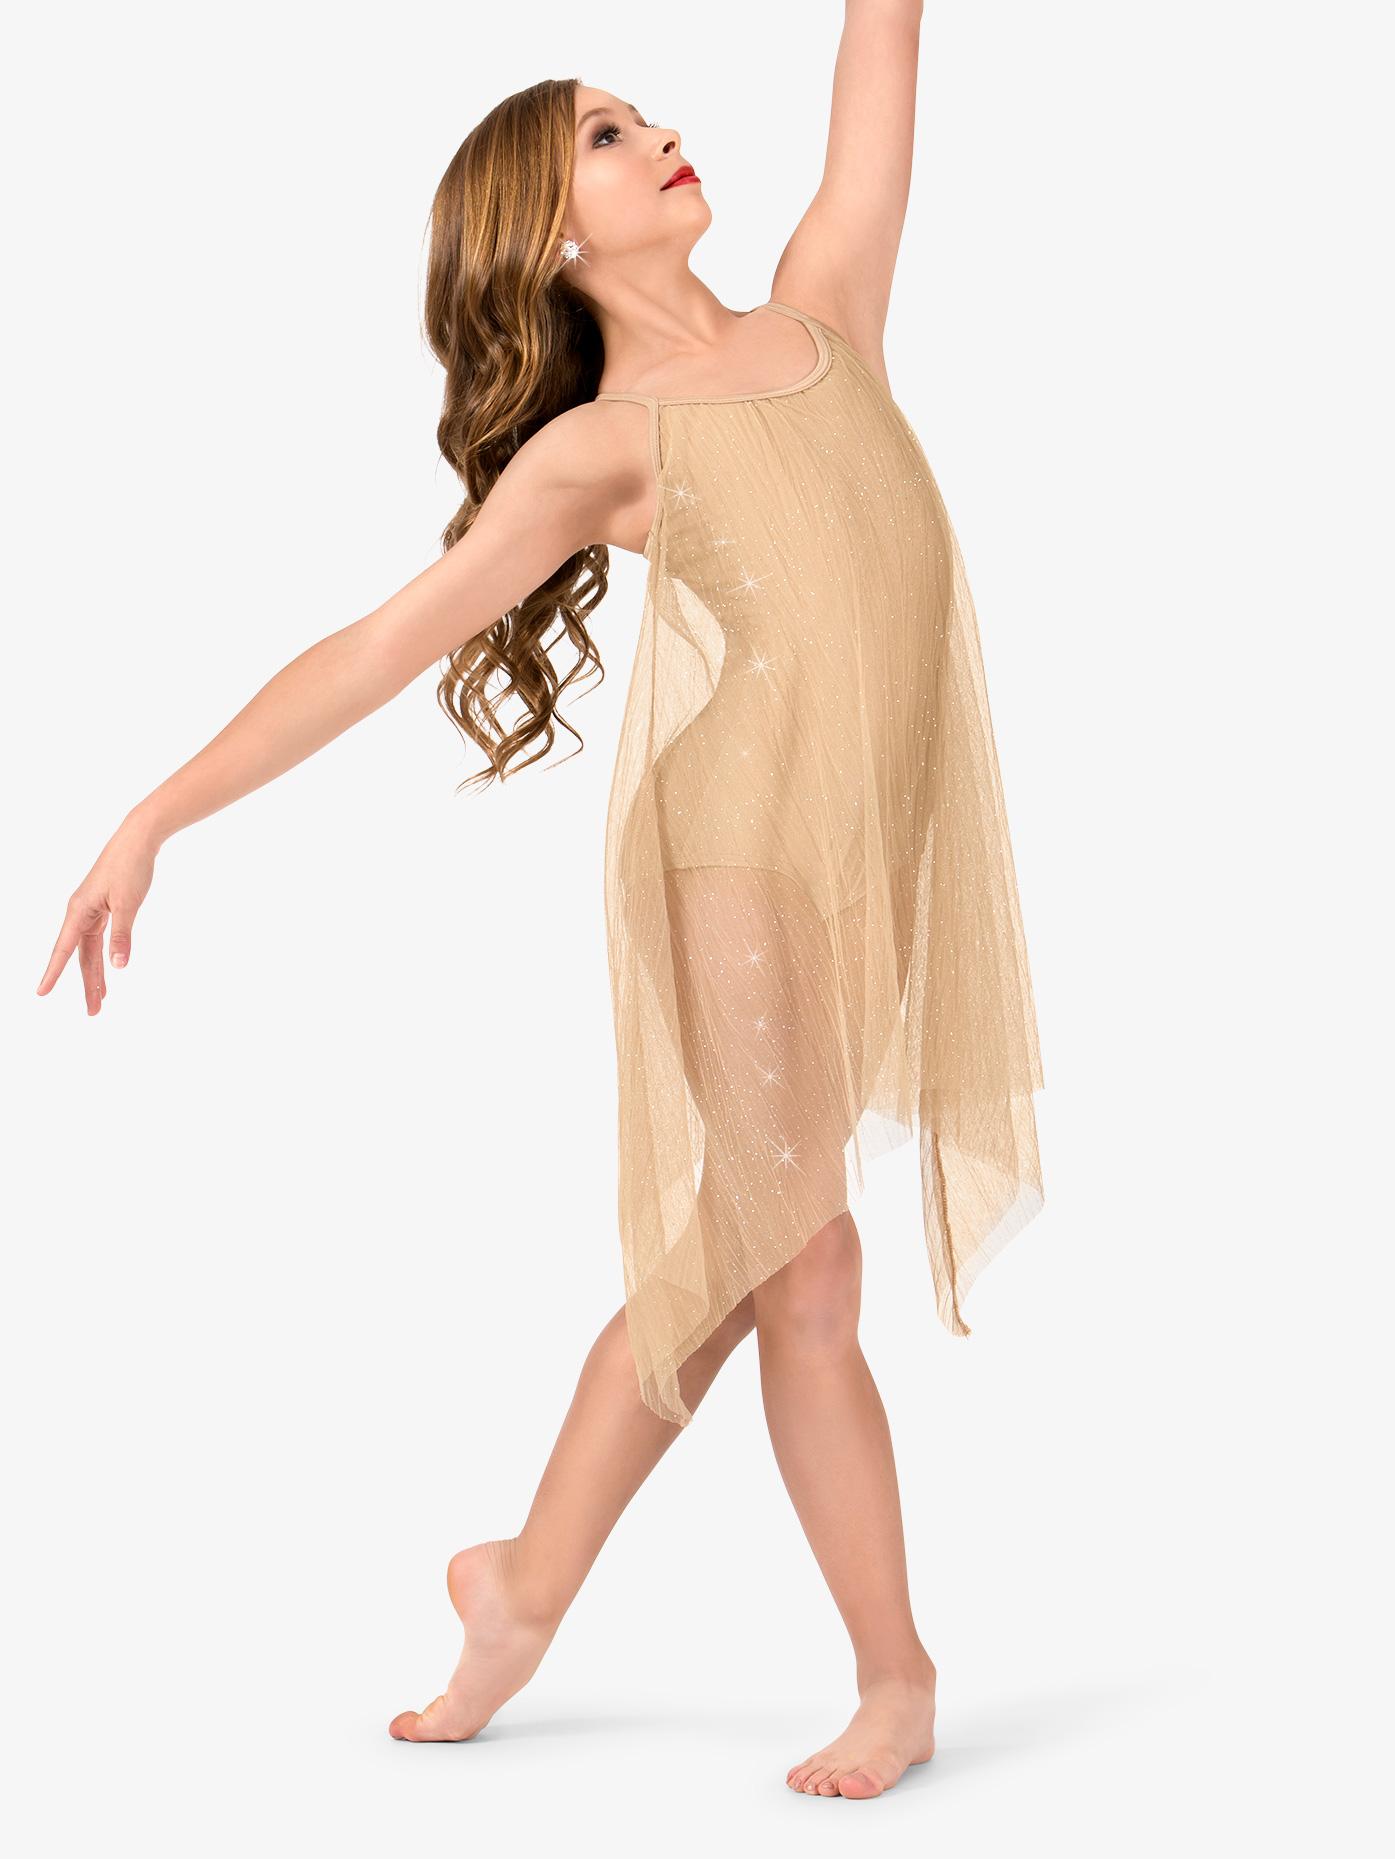 Elisse by Double Platinum Girls Glitter Mesh Camisole Performance Dress N7473C